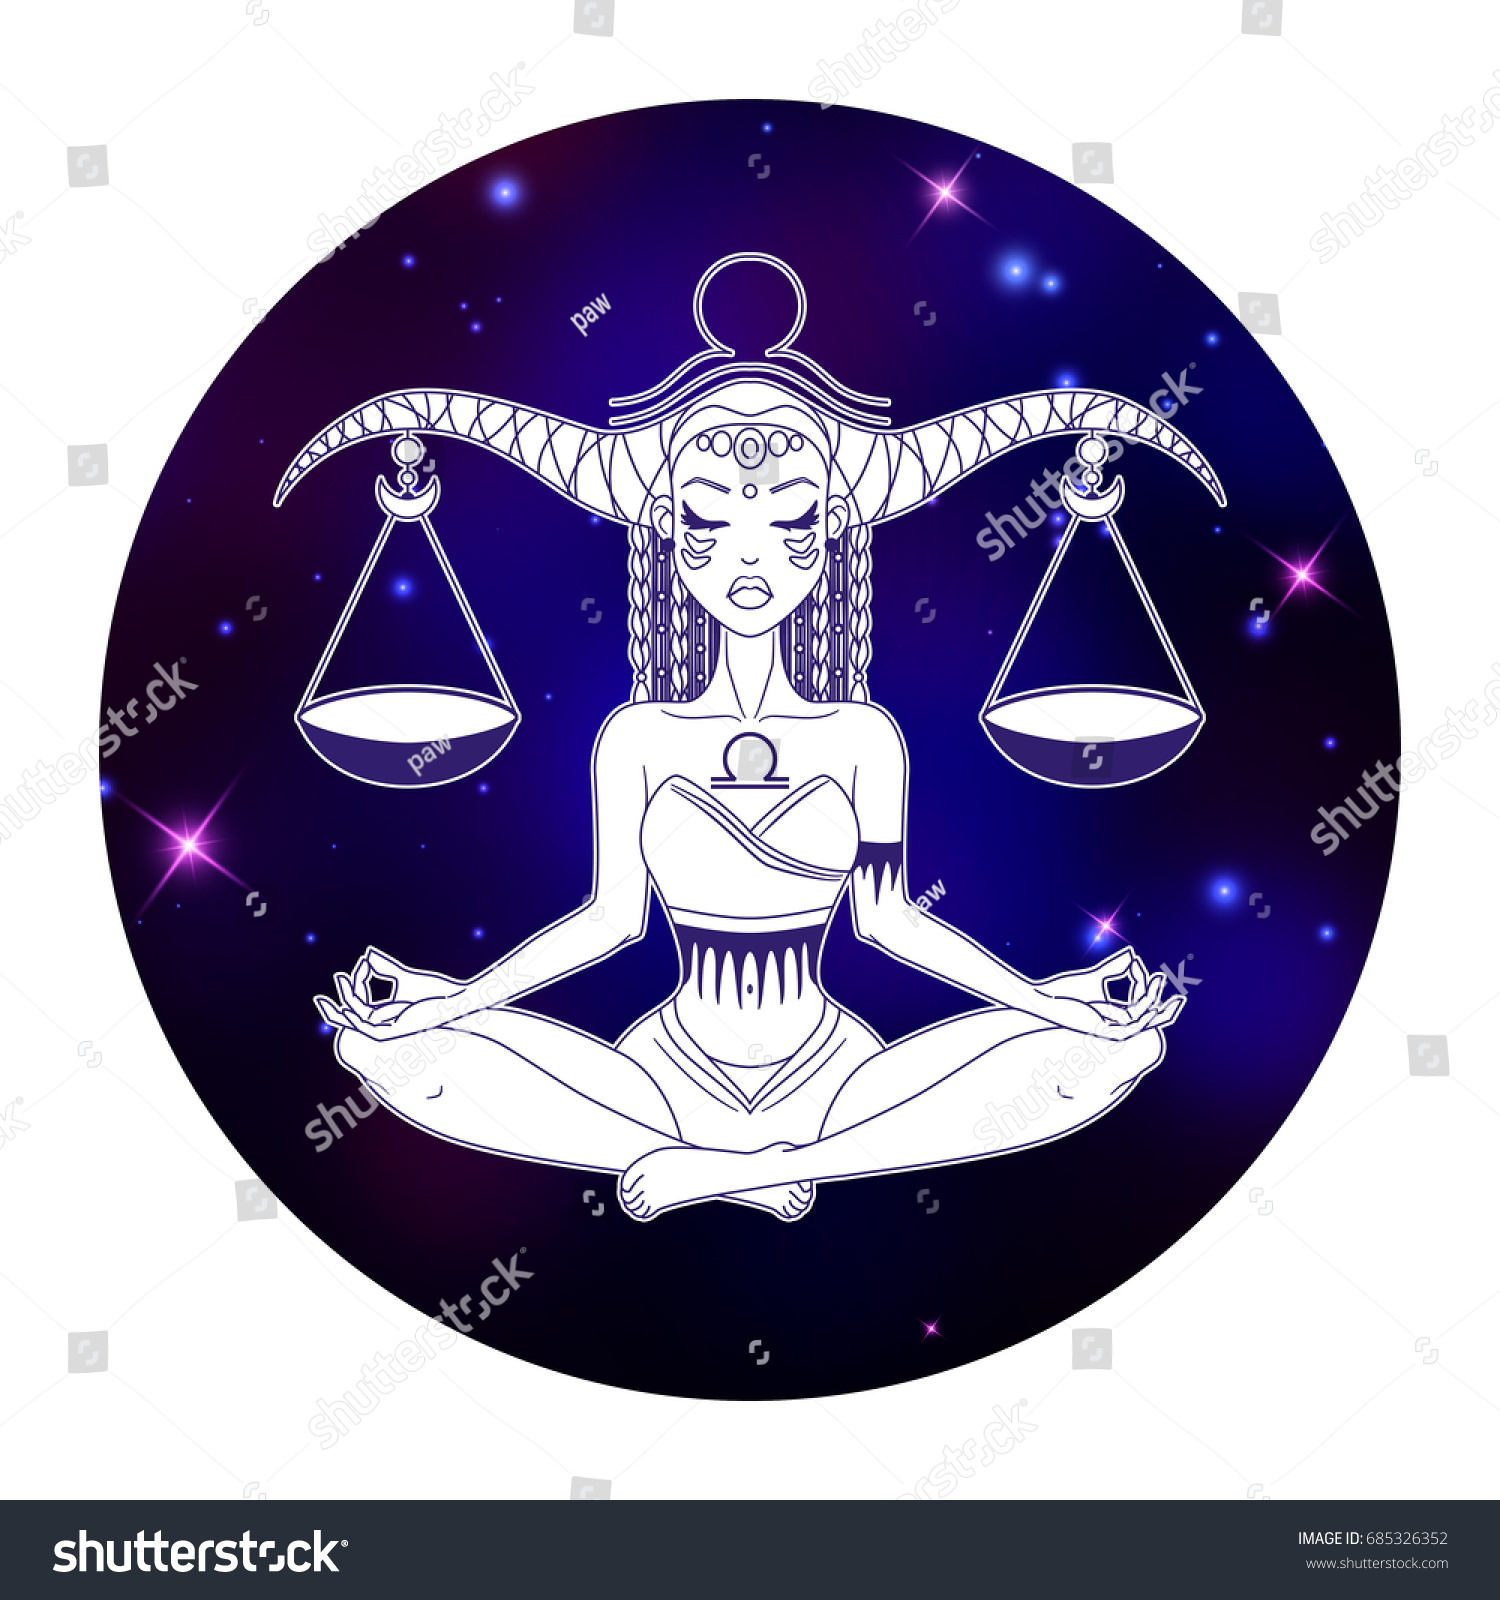 Libra zodiac sign horoscope symbol vector stock vector 685326352 libra zodiac sign horoscope symbol vector illustration biocorpaavc Choice Image